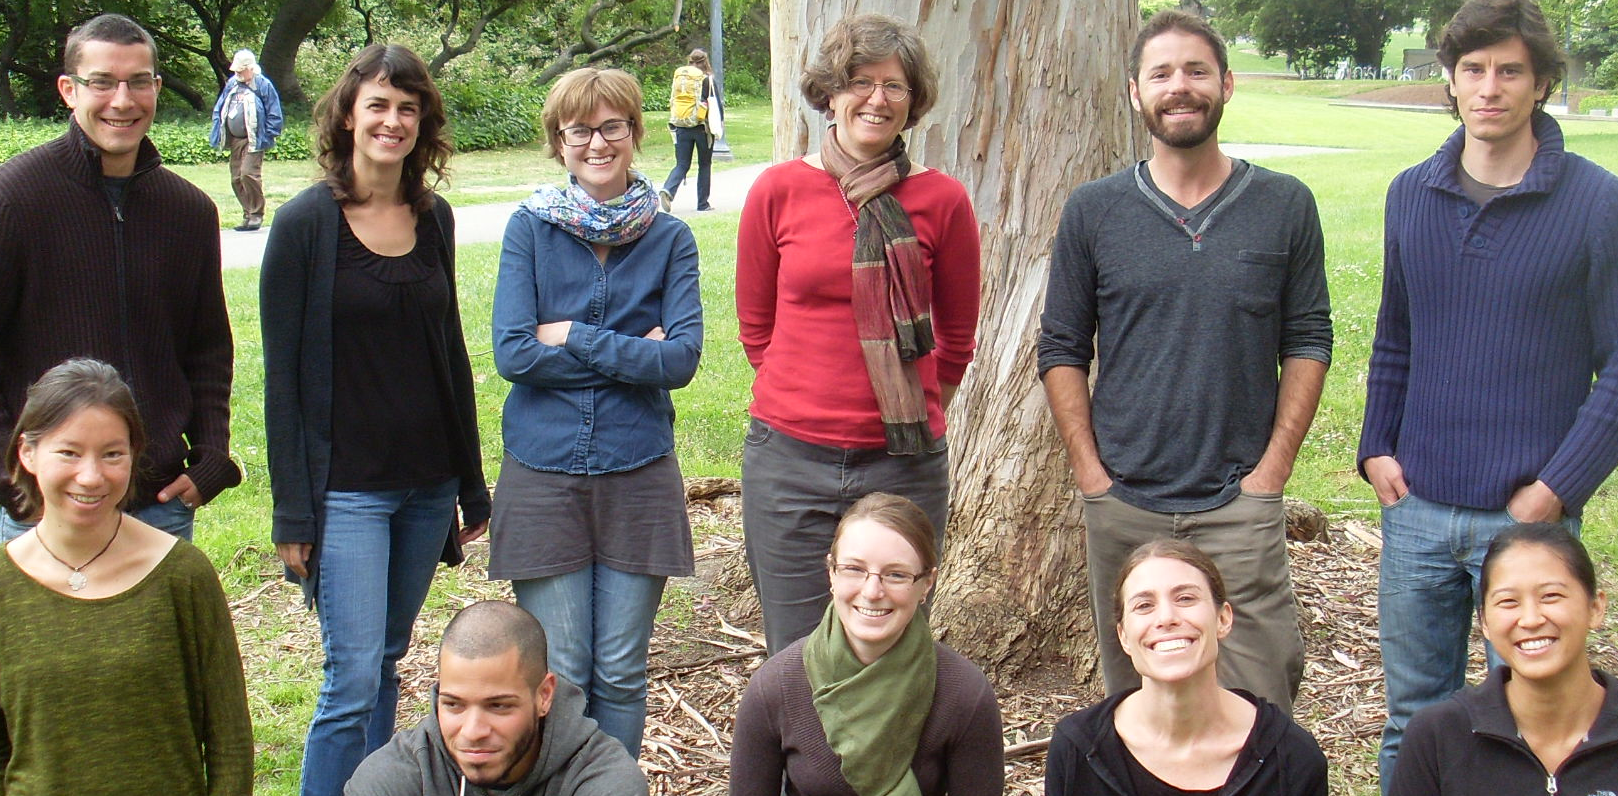 Feller lab - 2013 - Back; ryan, Georgeann, Anna, Marla, Aaron, Remi. Front: Alana, David, Lowry, Michal and Melissa